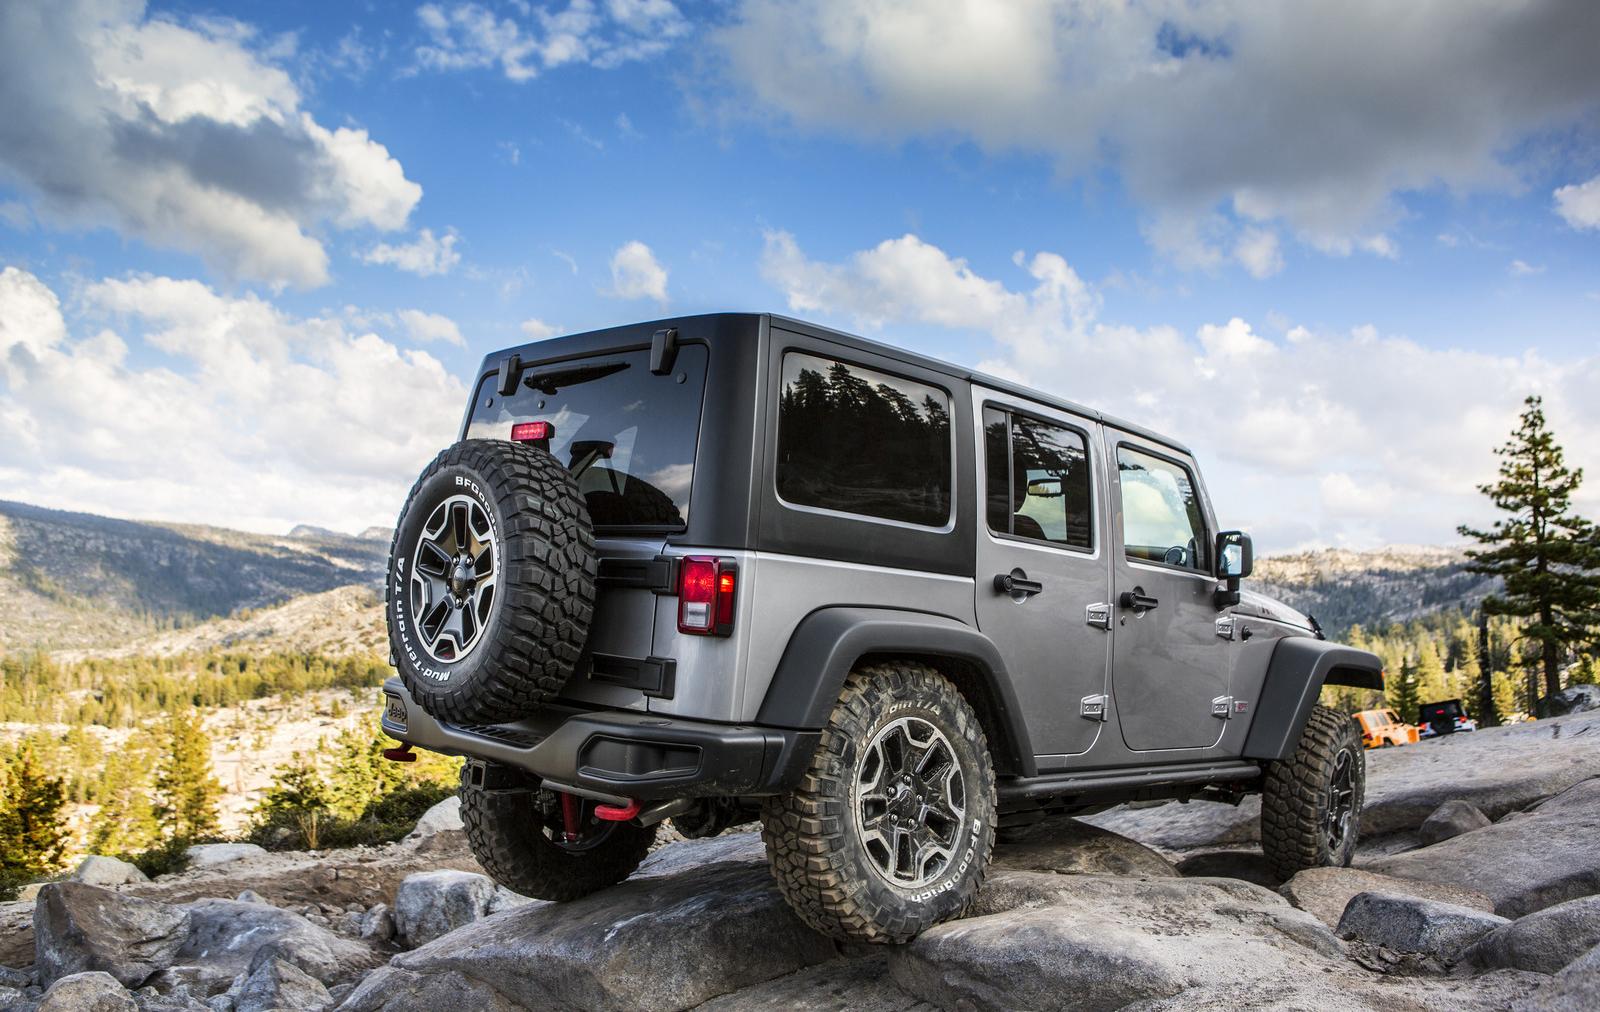 2013_jeep_wrangler_rubicon_10th_anniversary_8_1600x1200.jpg